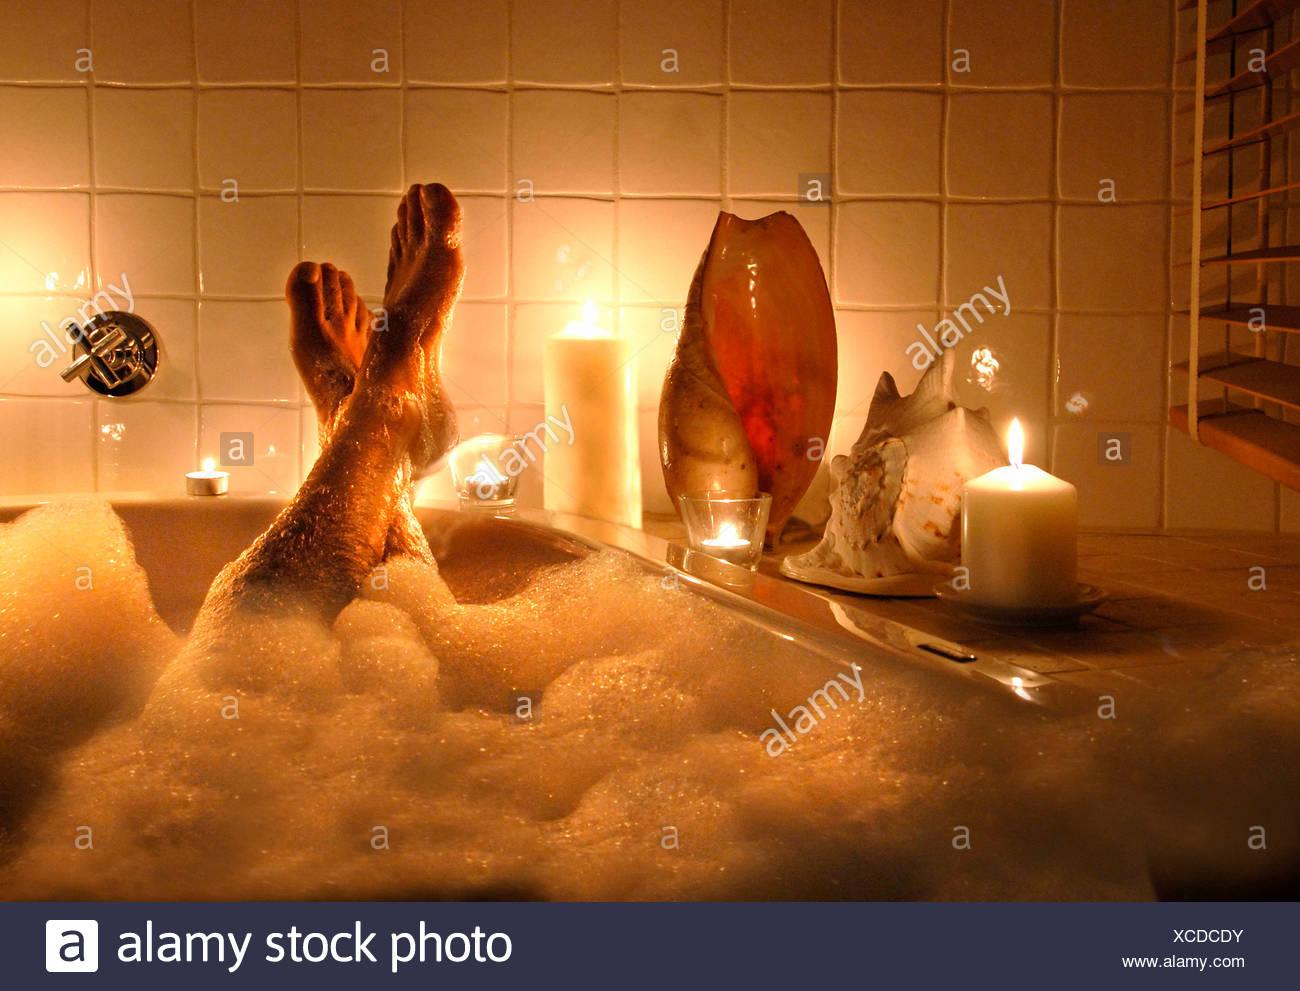 Vasca Da Bagno Relax : Benessere bagno vasca da bagno relax e piacere bottino donna